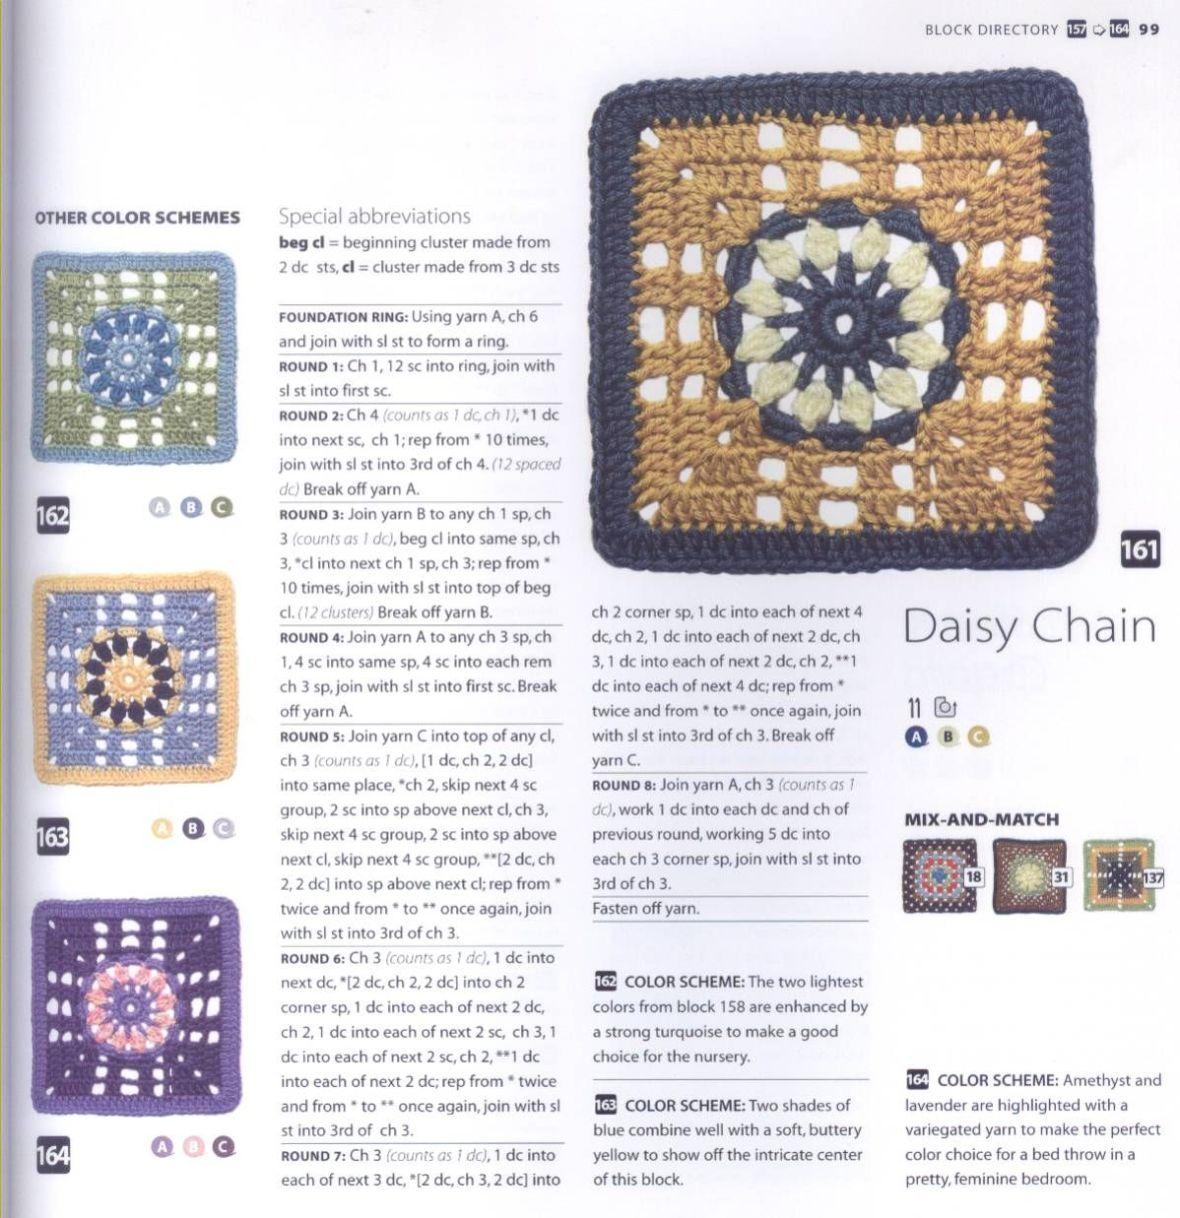 200 Crocheted Blocks for blankets, throws & Afghans 099